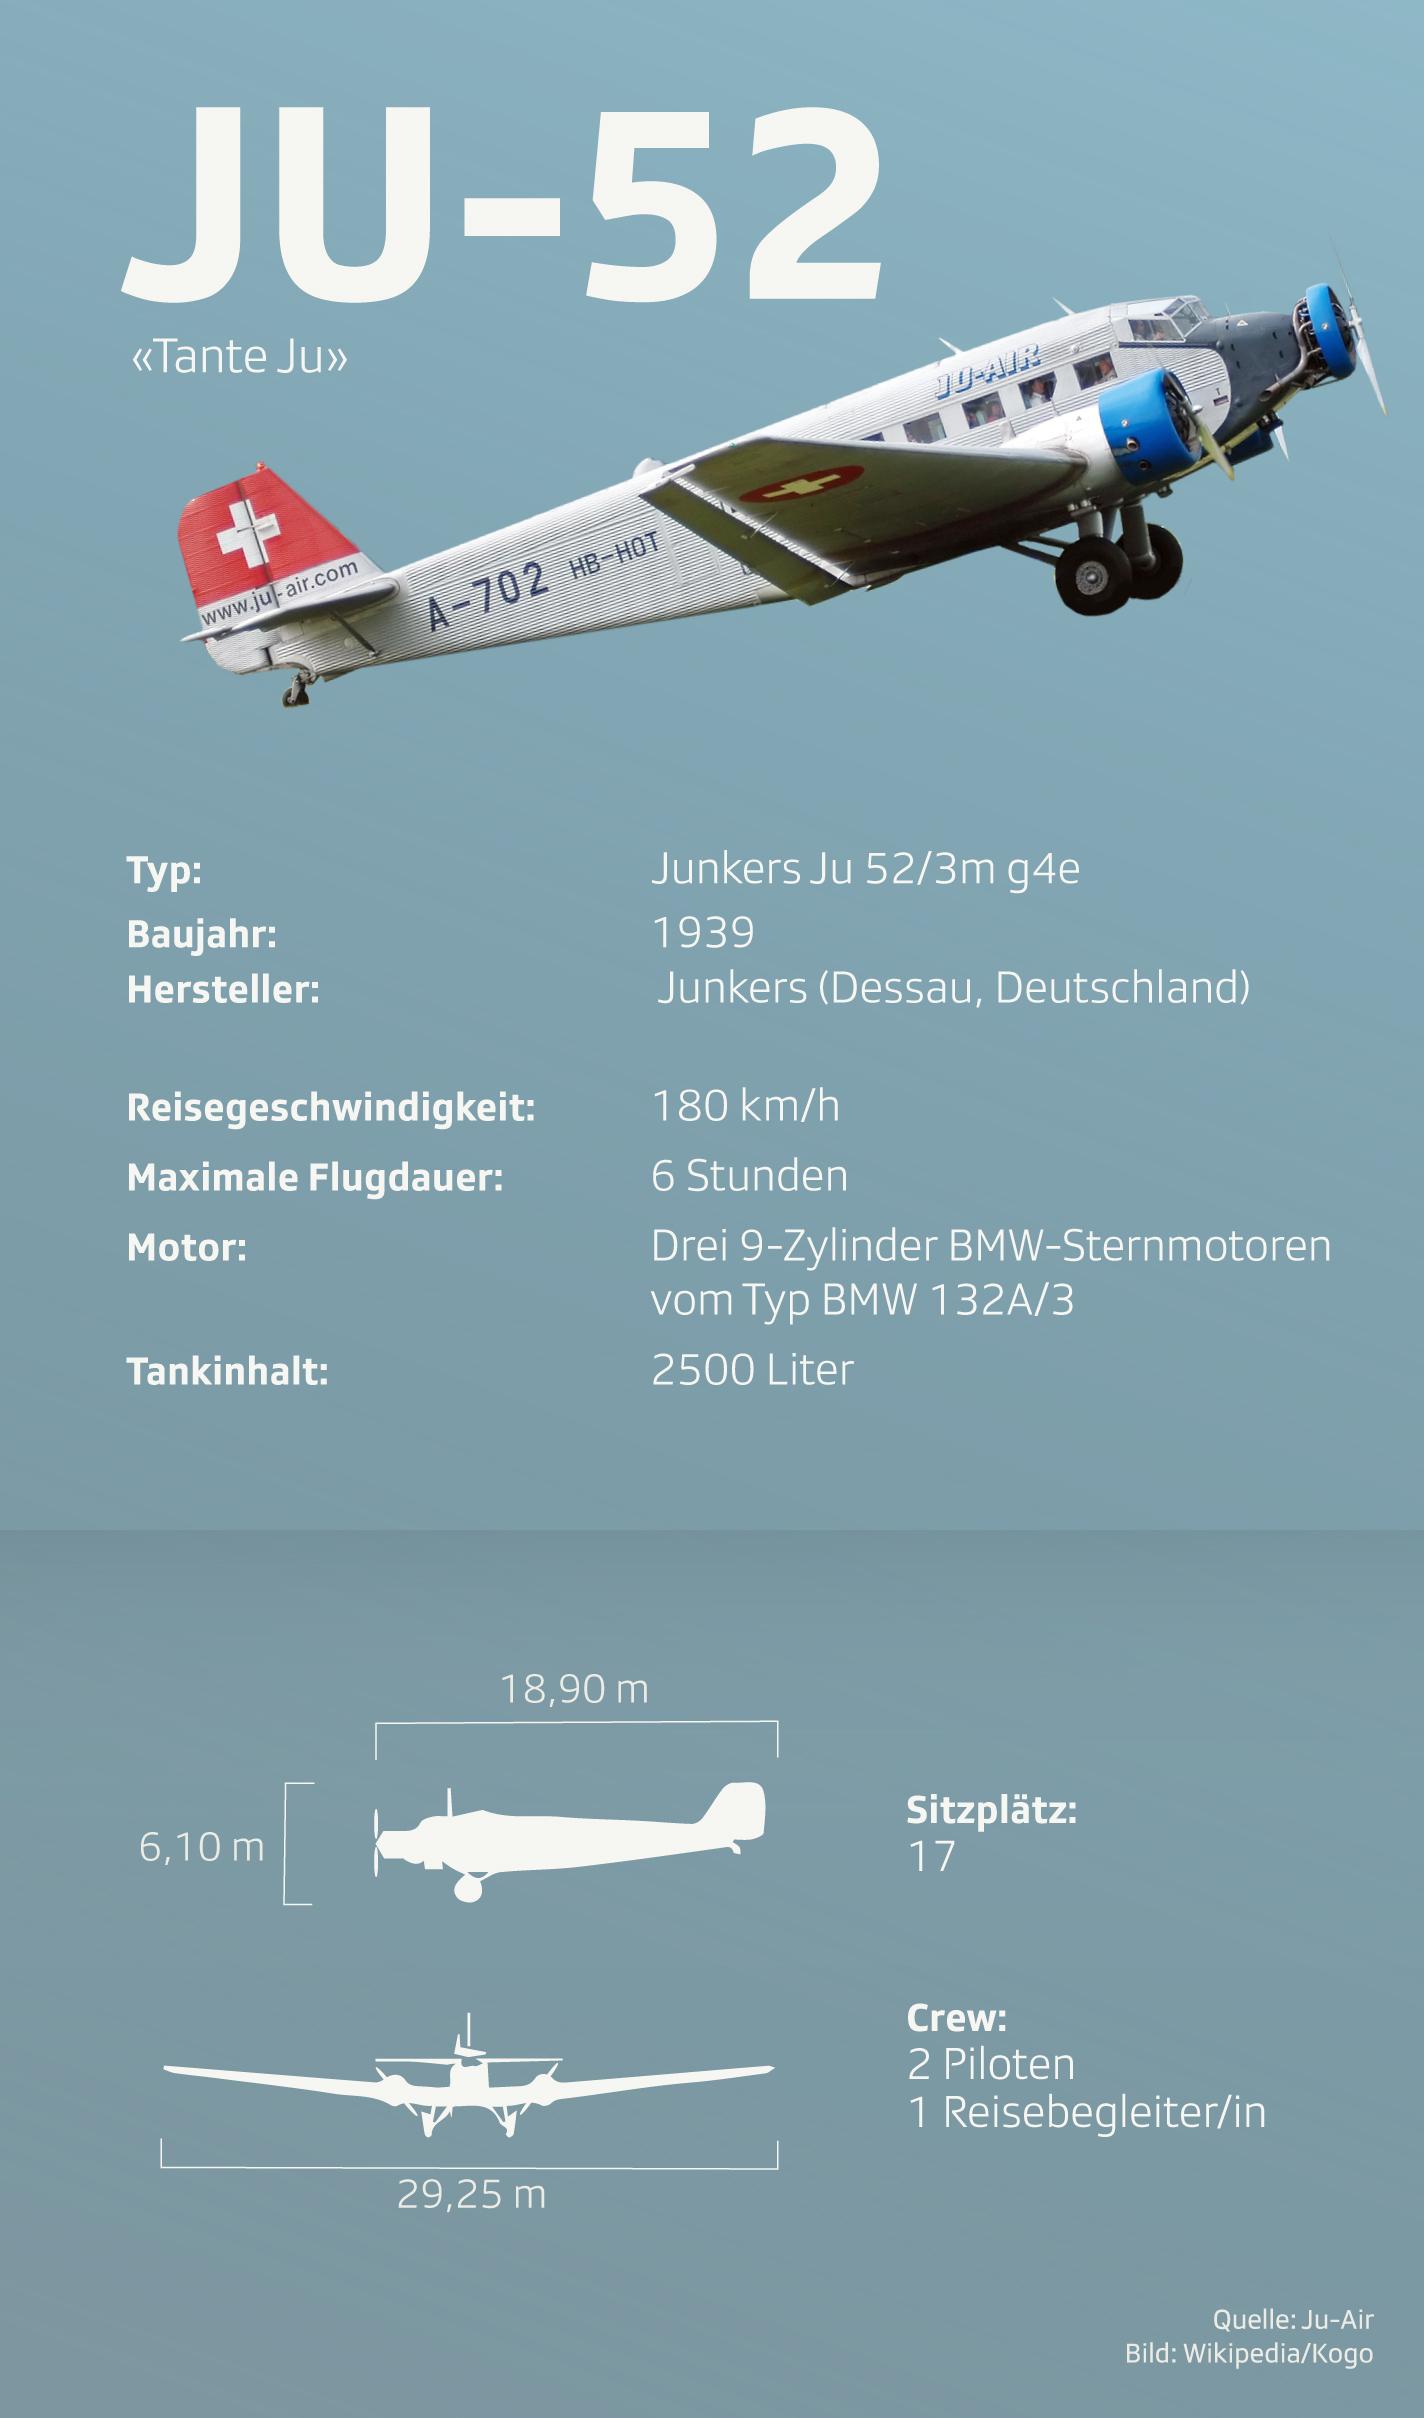 Datenblatt zur JU 52